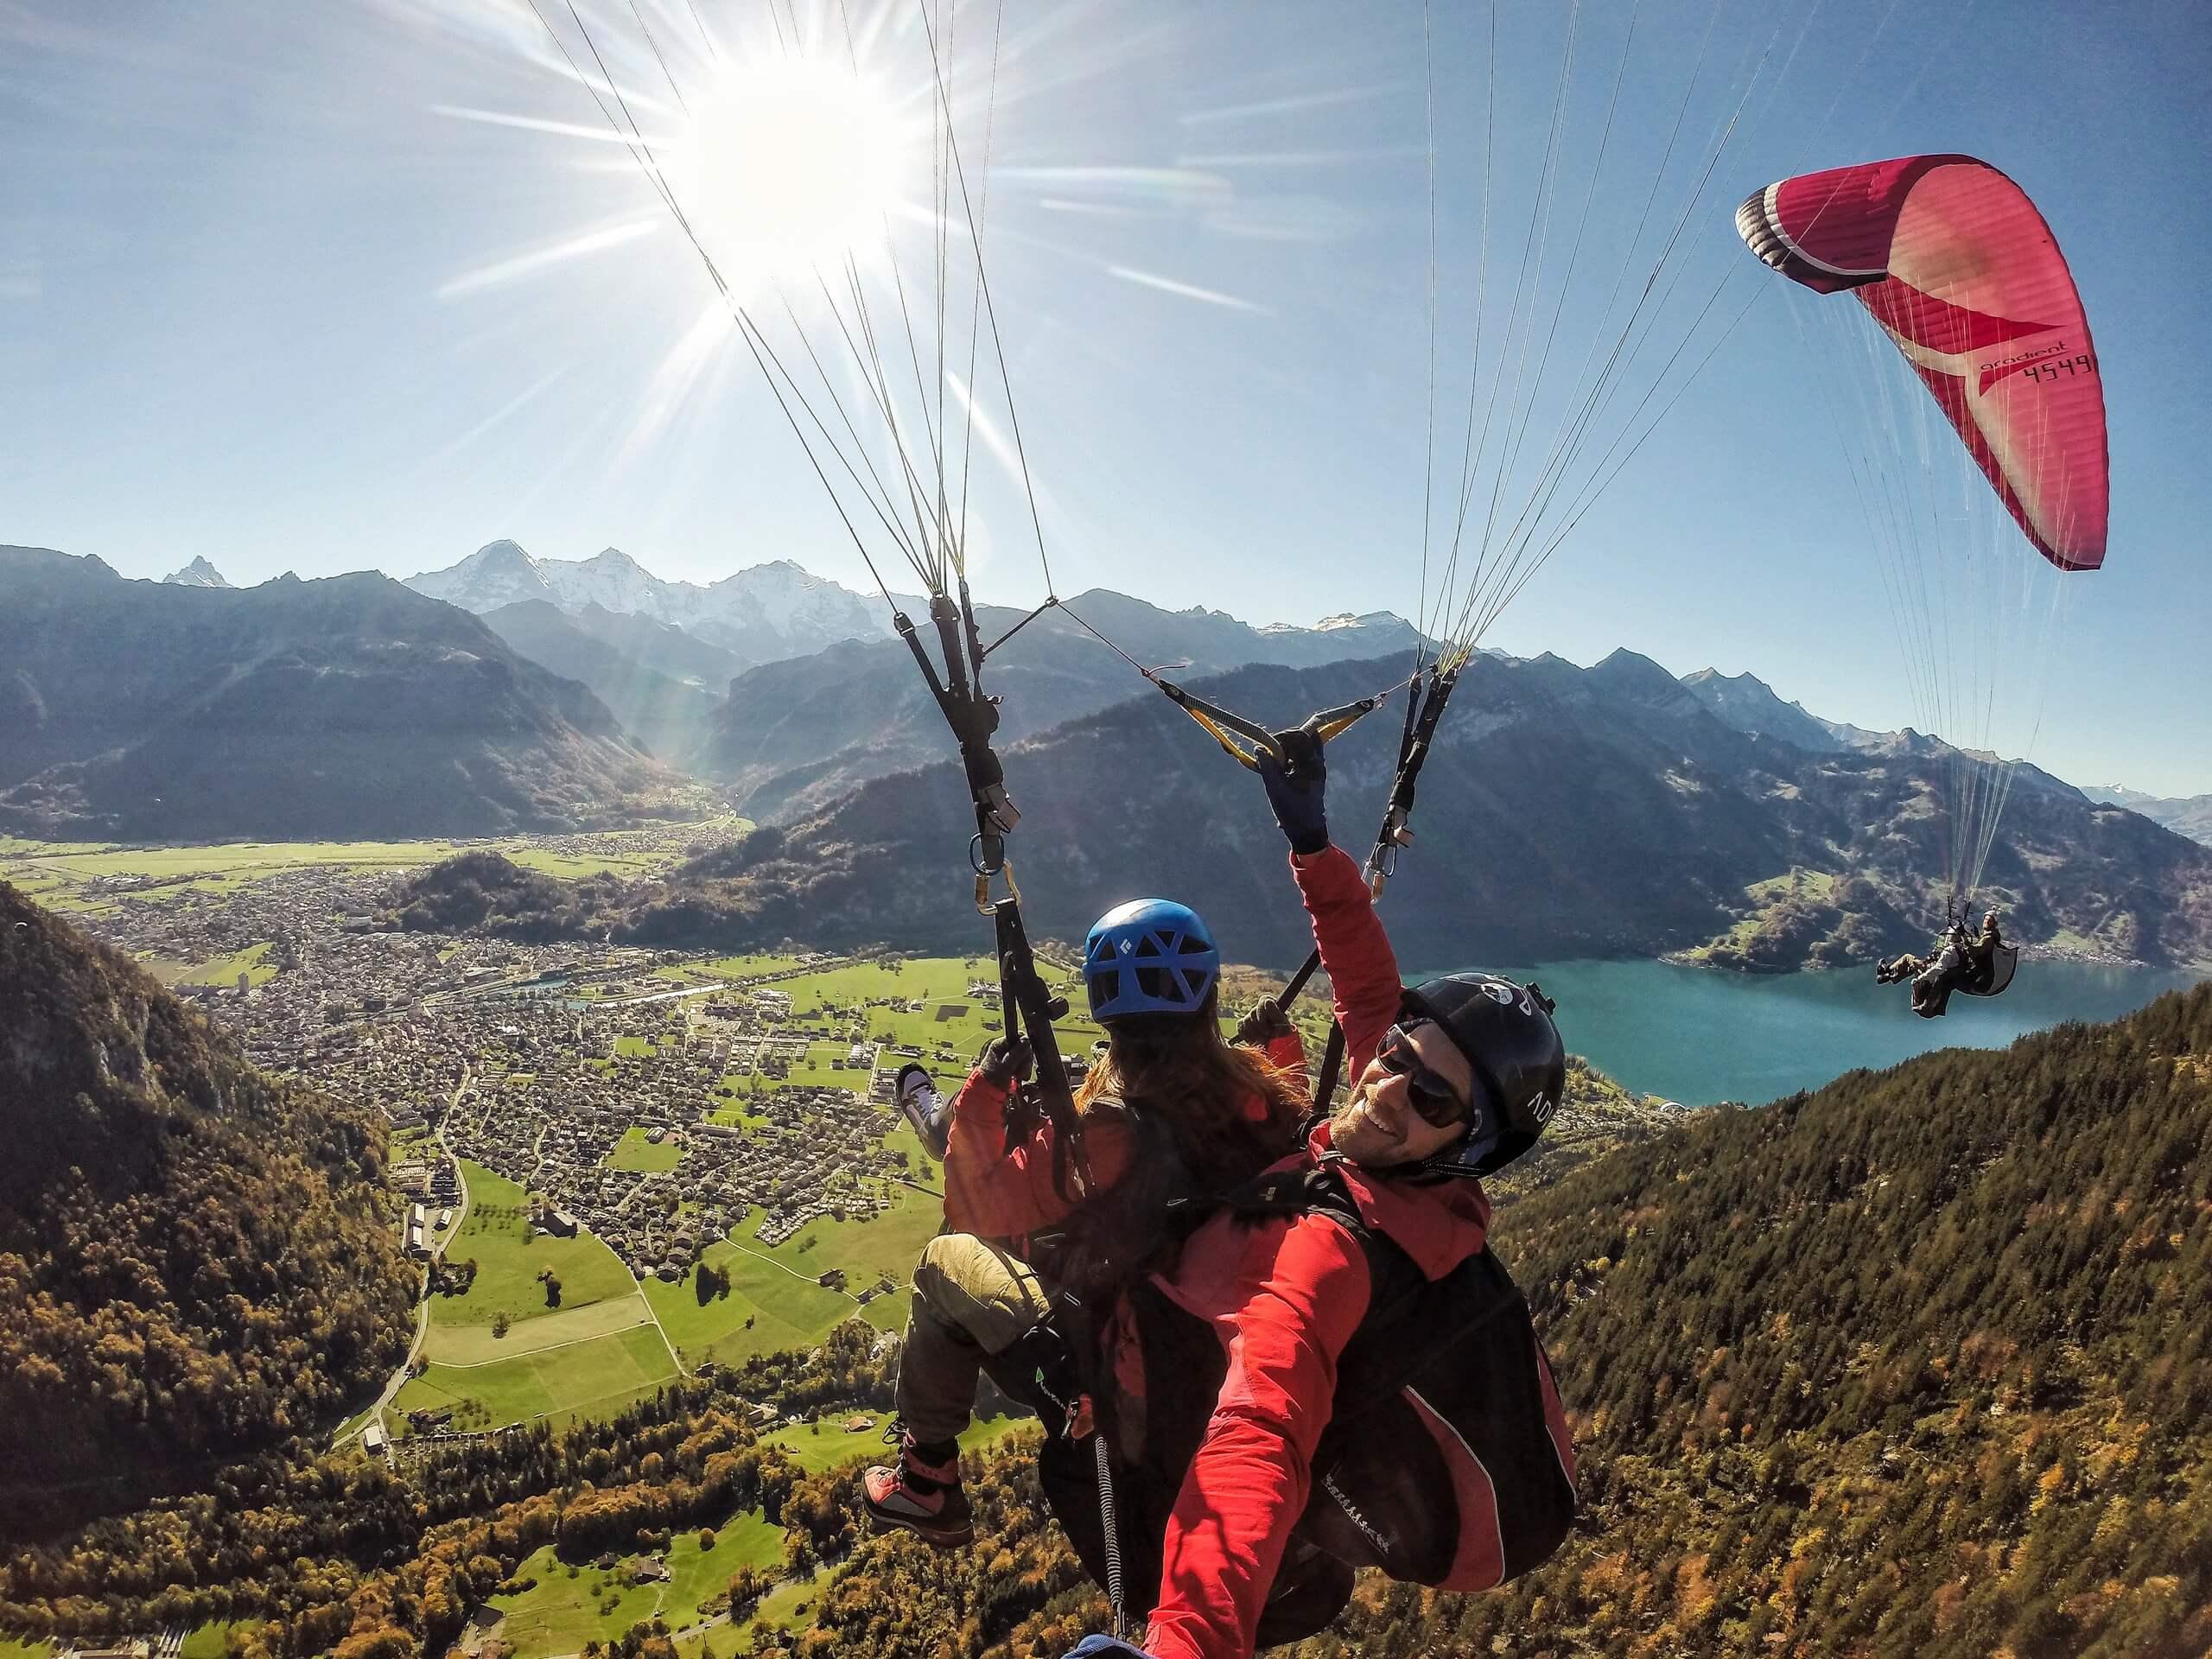 skywings-paragliding-interlaken-herbst-thunersee-sonne